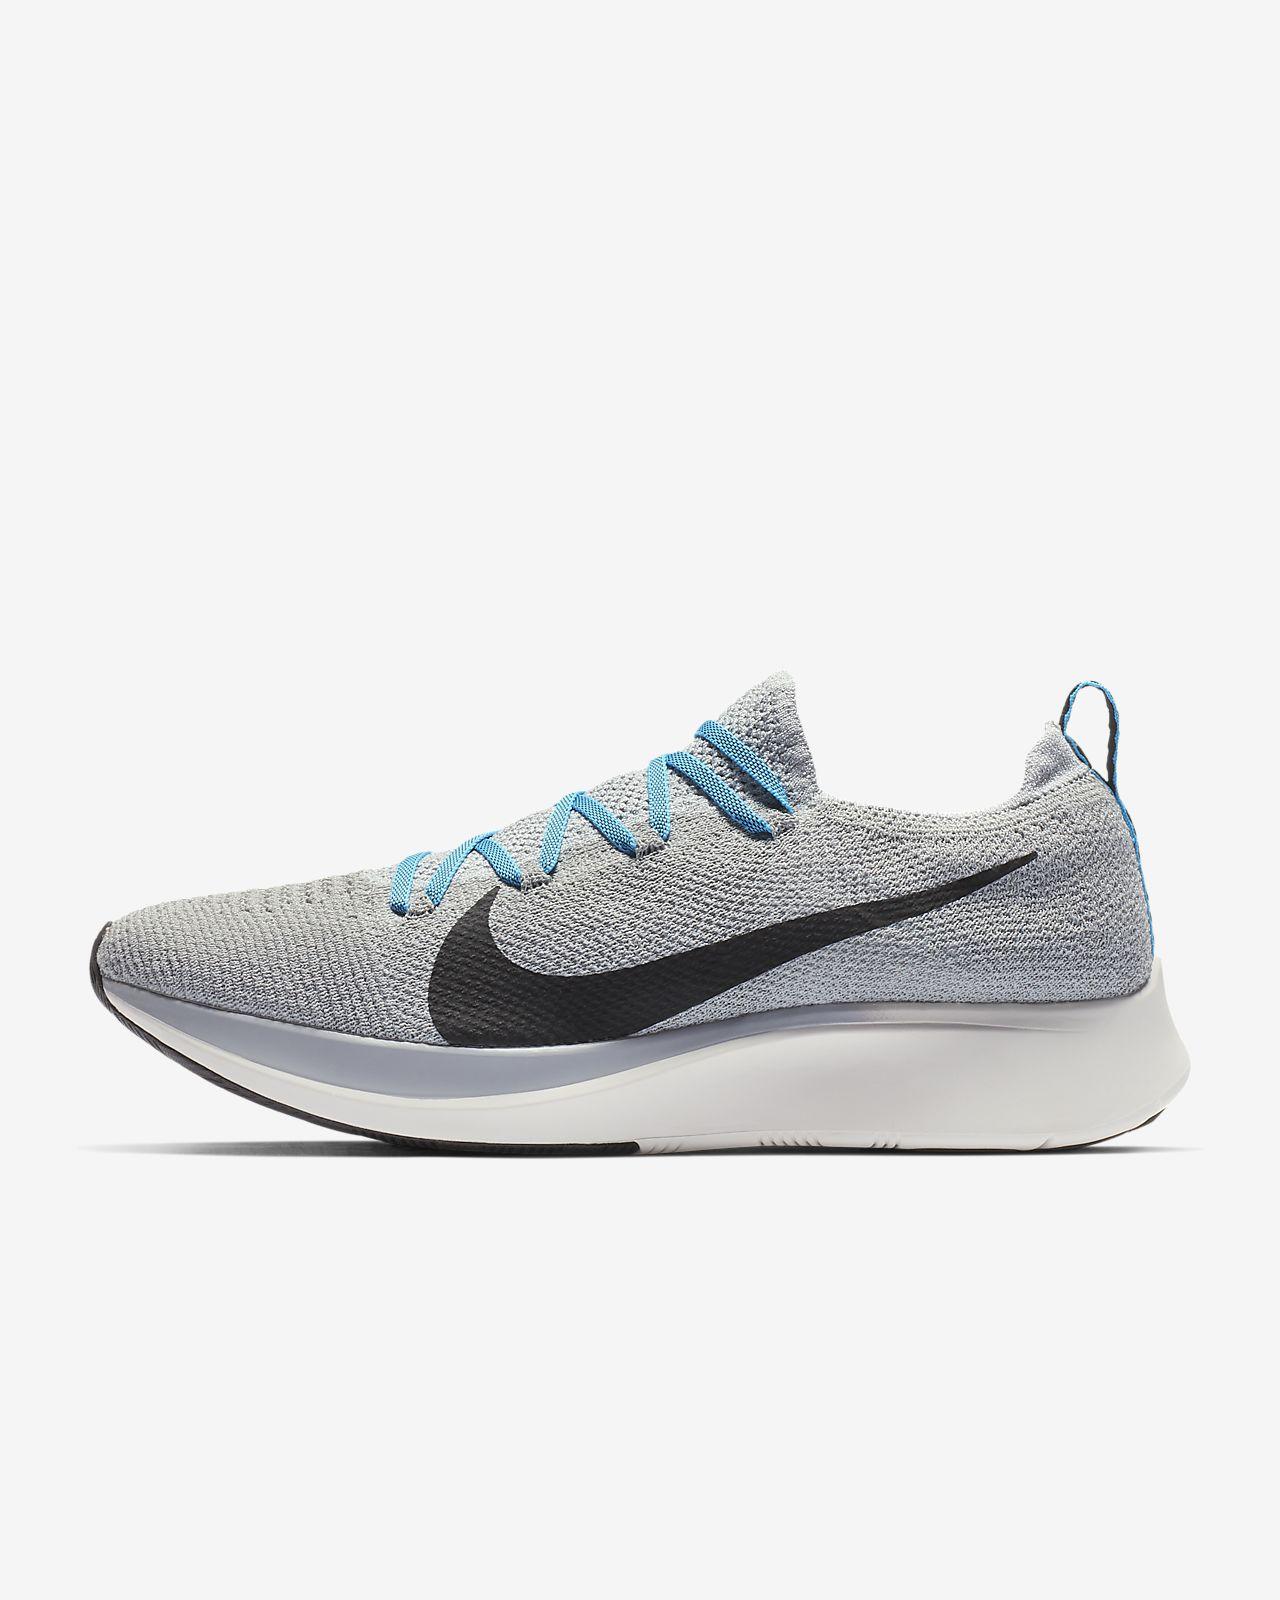 8e5eb6fe82c73 Nike Zoom Fly Flyknit Men s Running Shoe. Nike.com